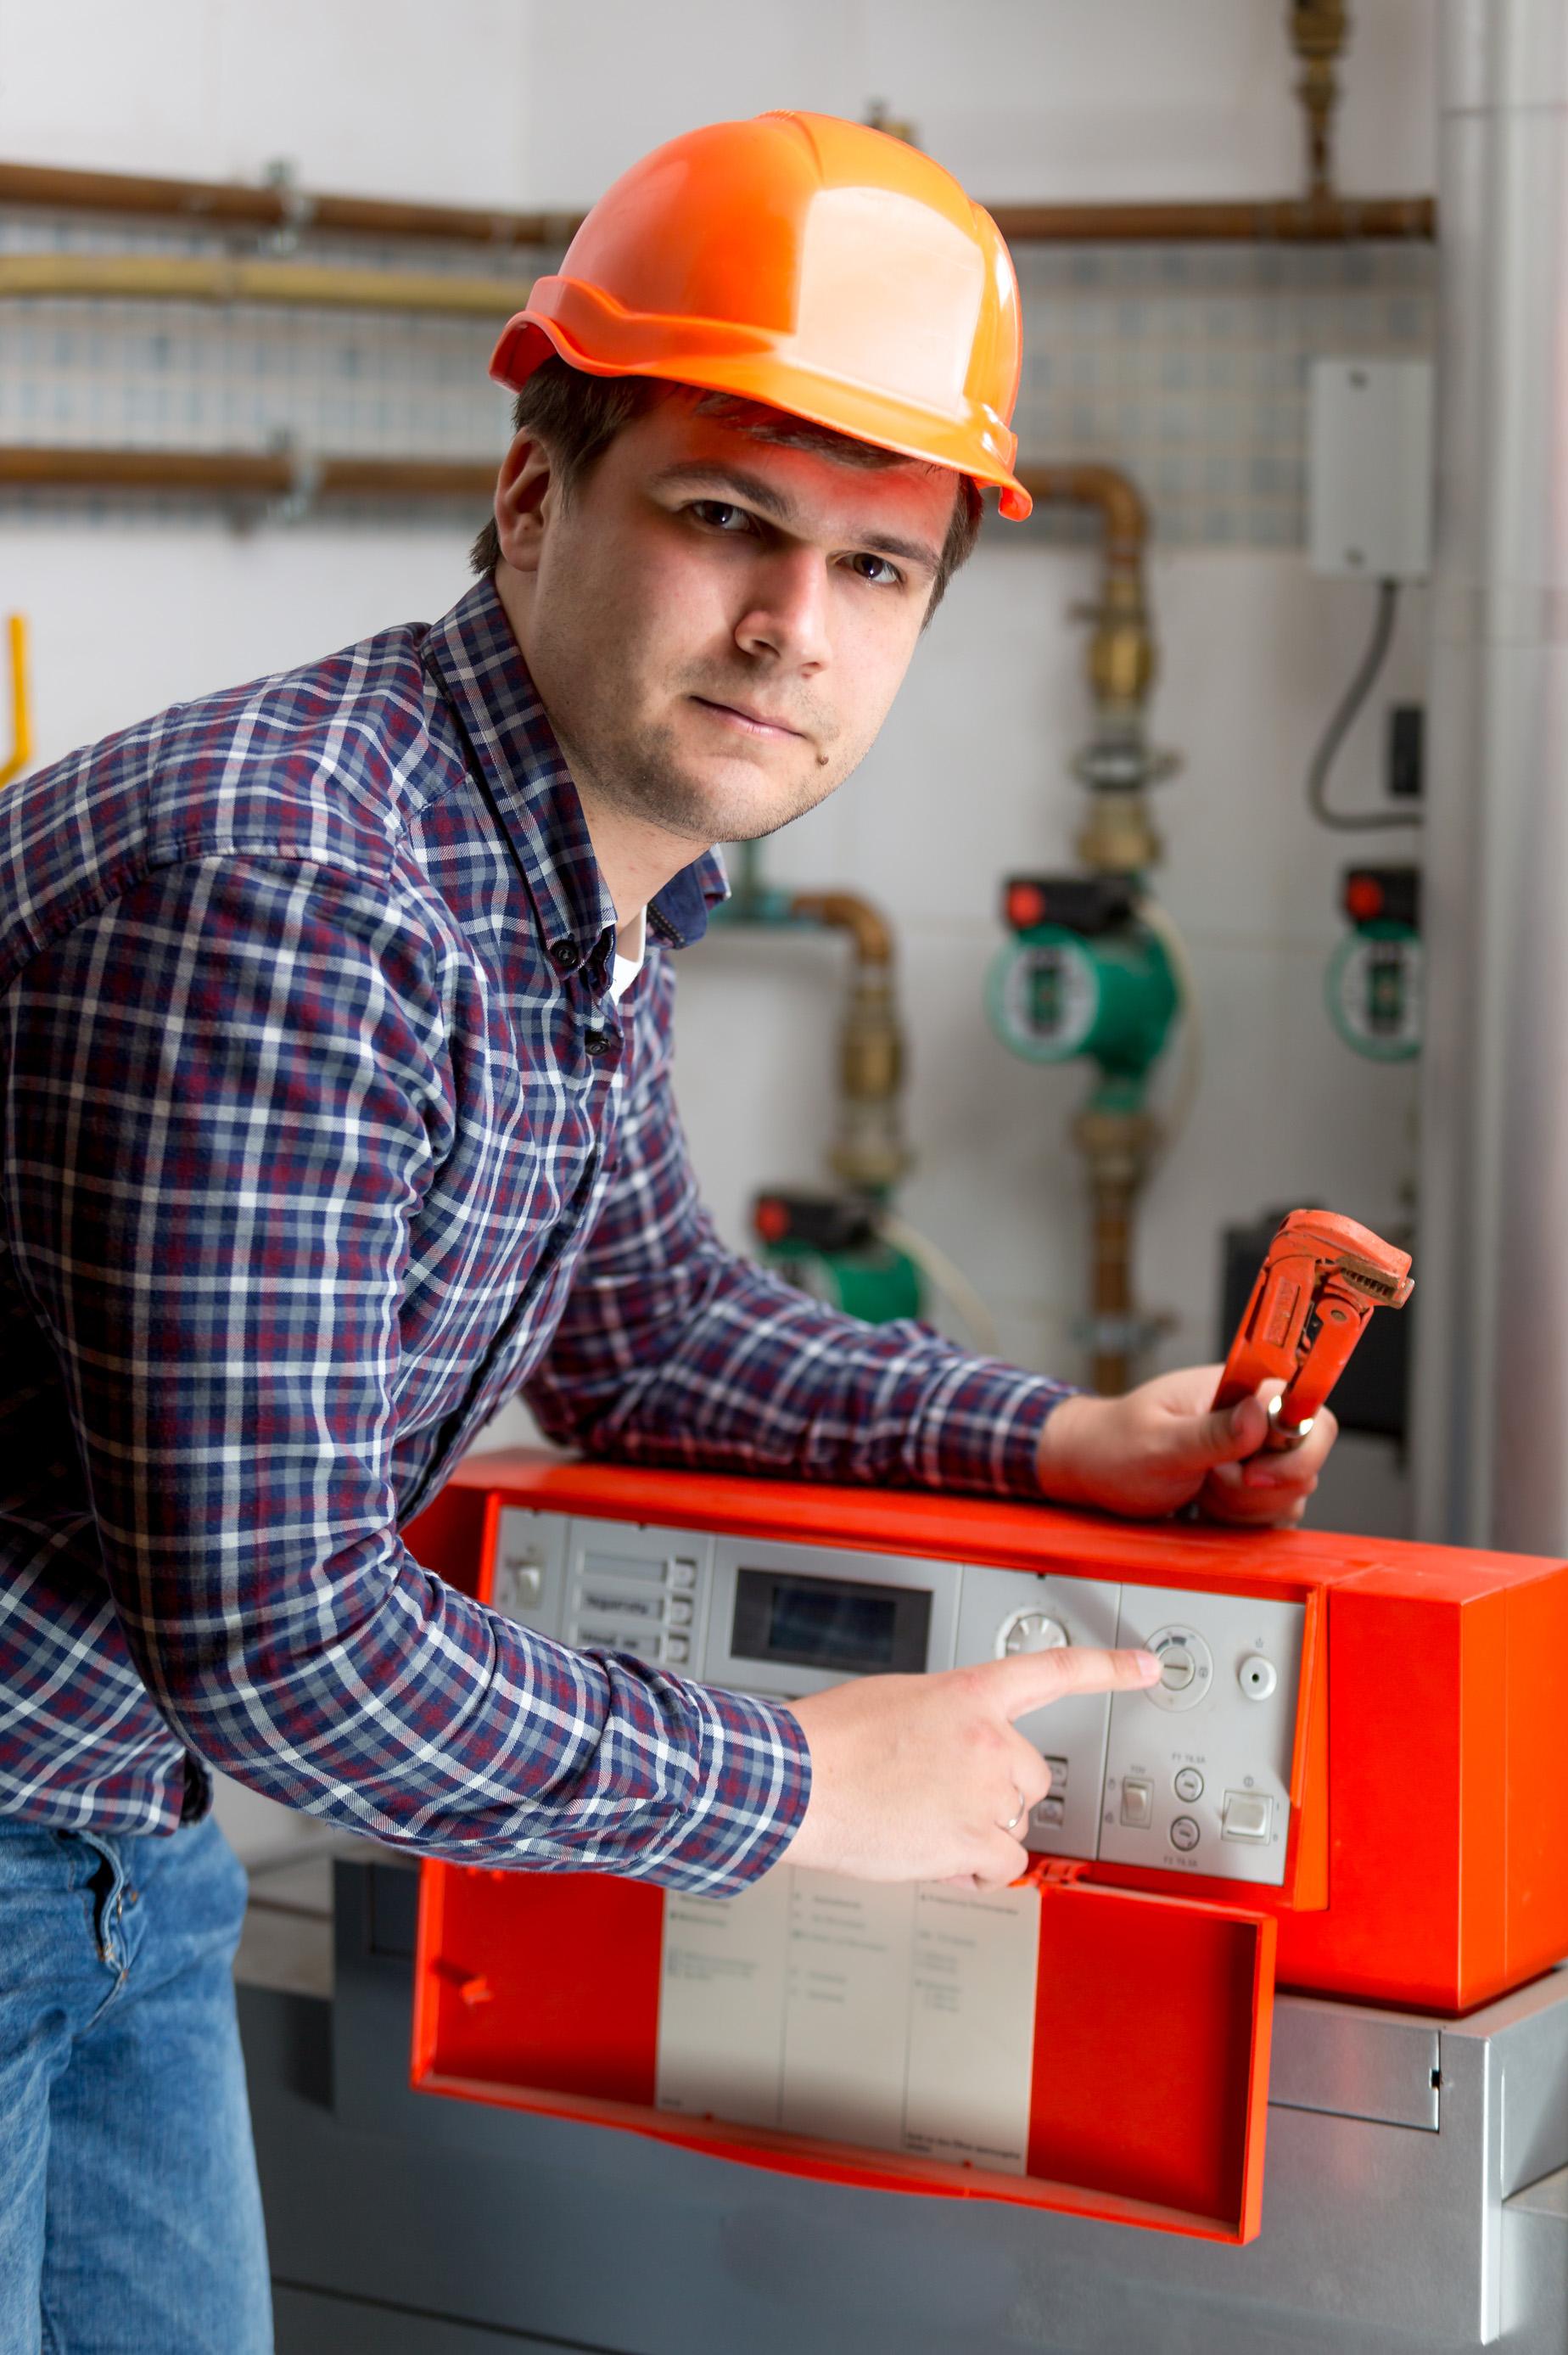 Engineer Adjusting Automated Control Dashboard